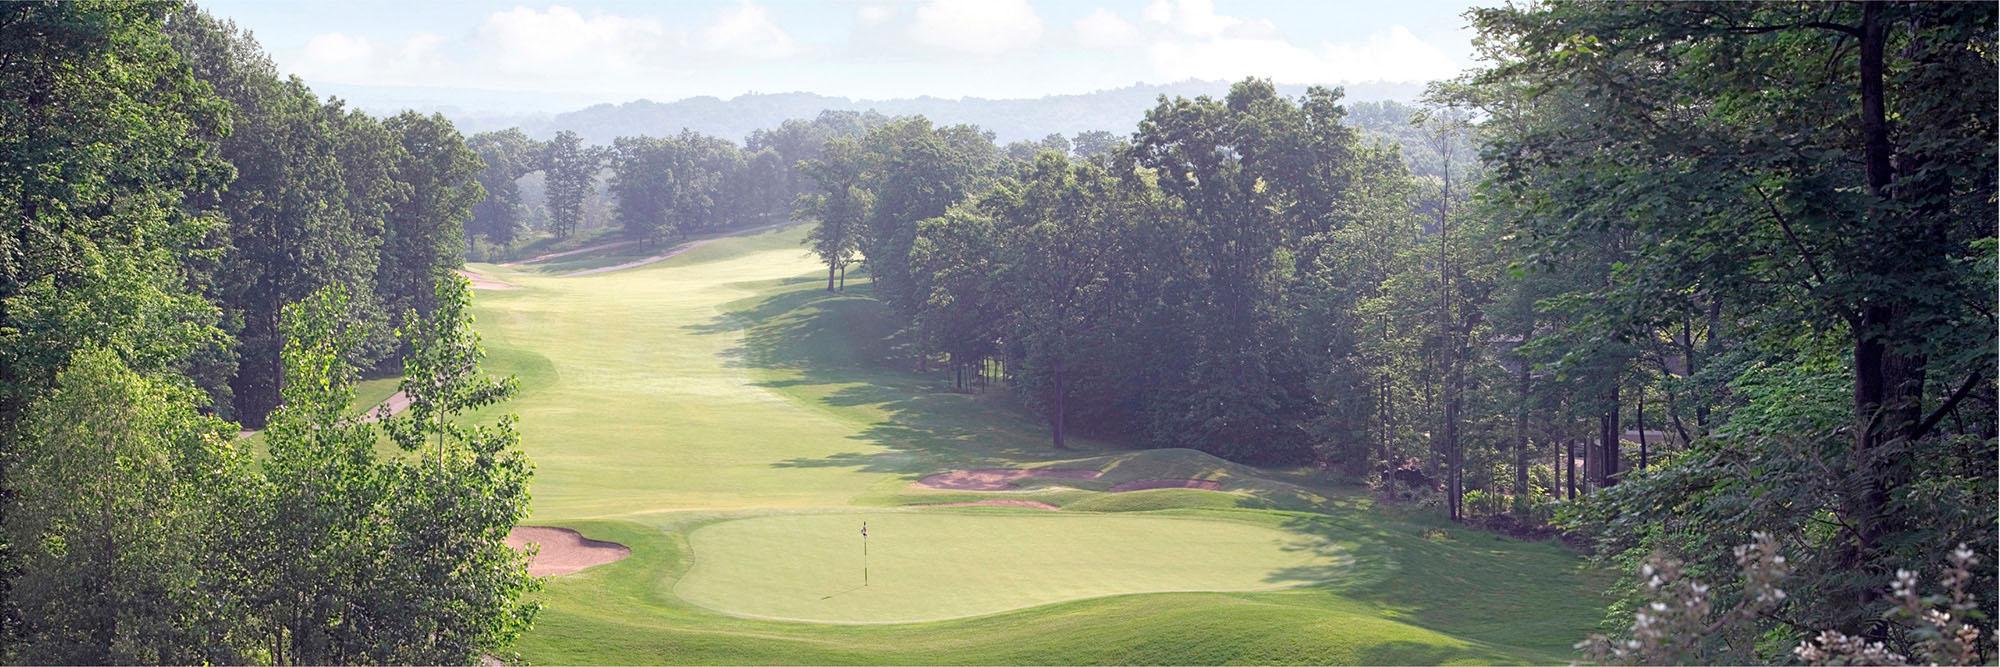 Golf Course Image - Thousand Oaks No. 12